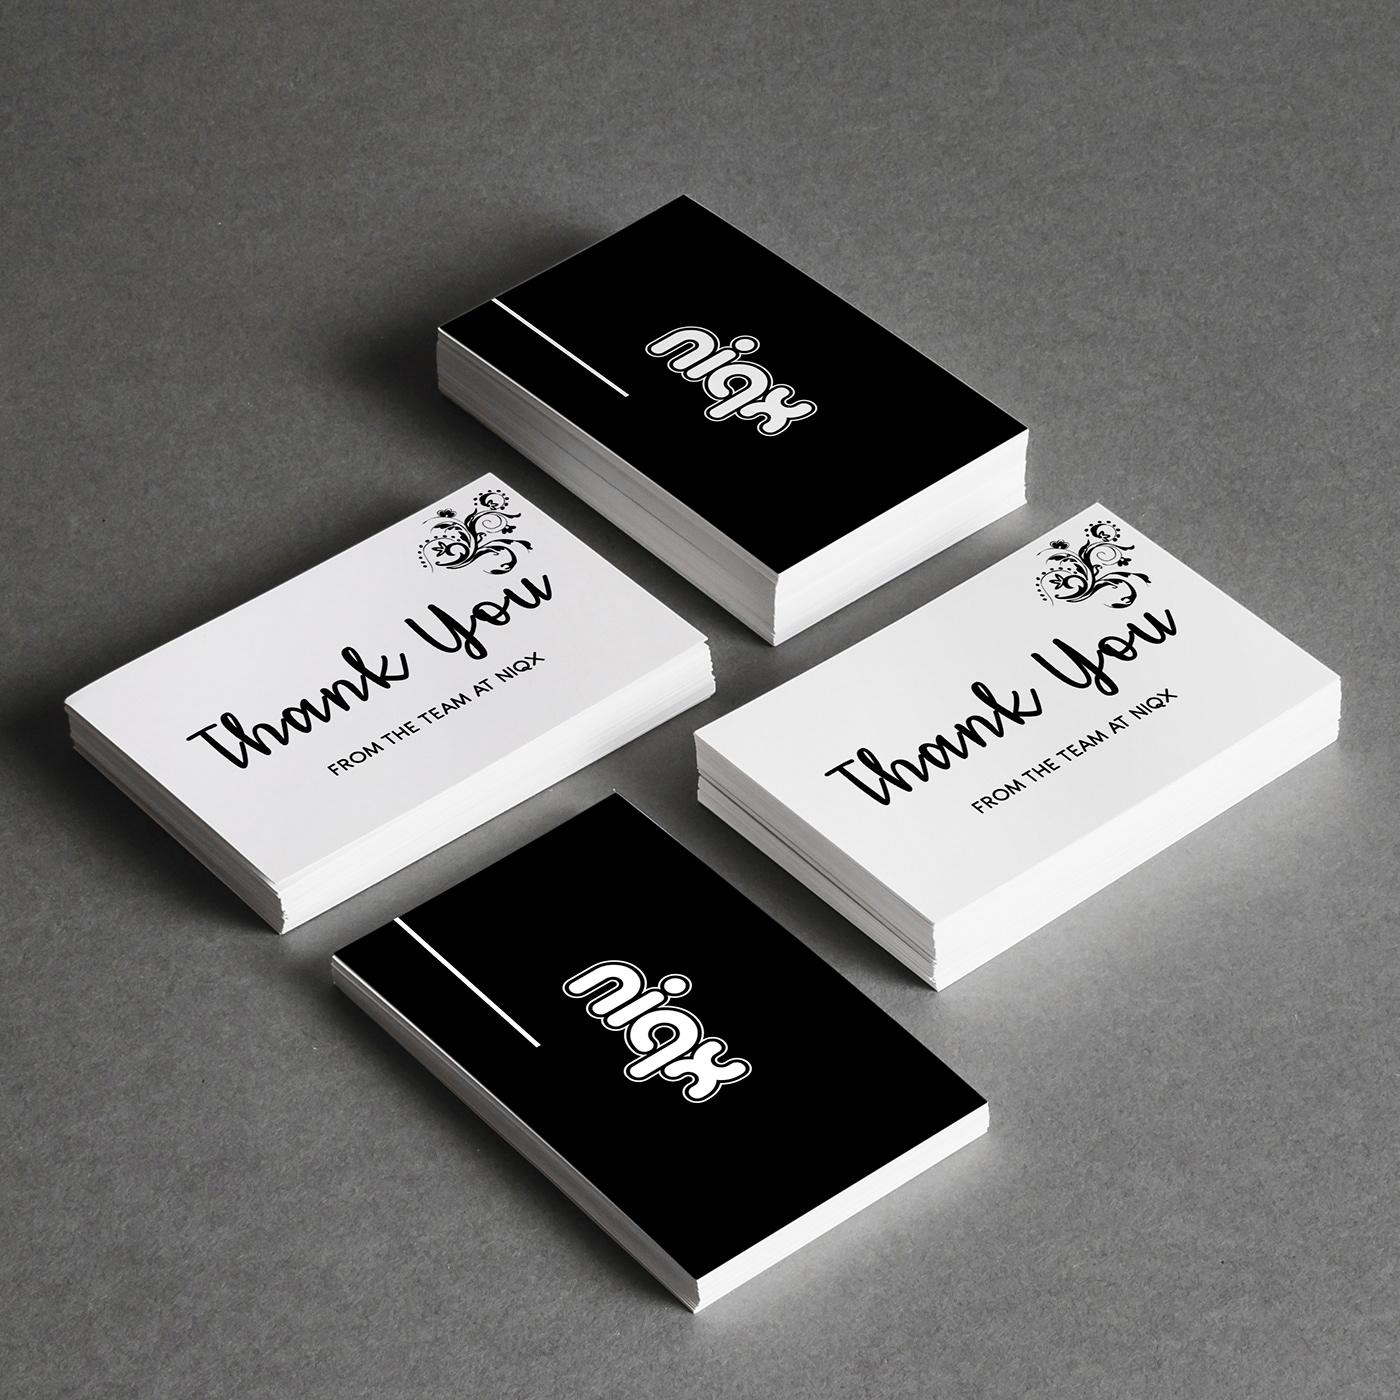 Logo Design branding  product design  mockups Thankyou cards gift bags shopping bags adobe illustrator photoshop